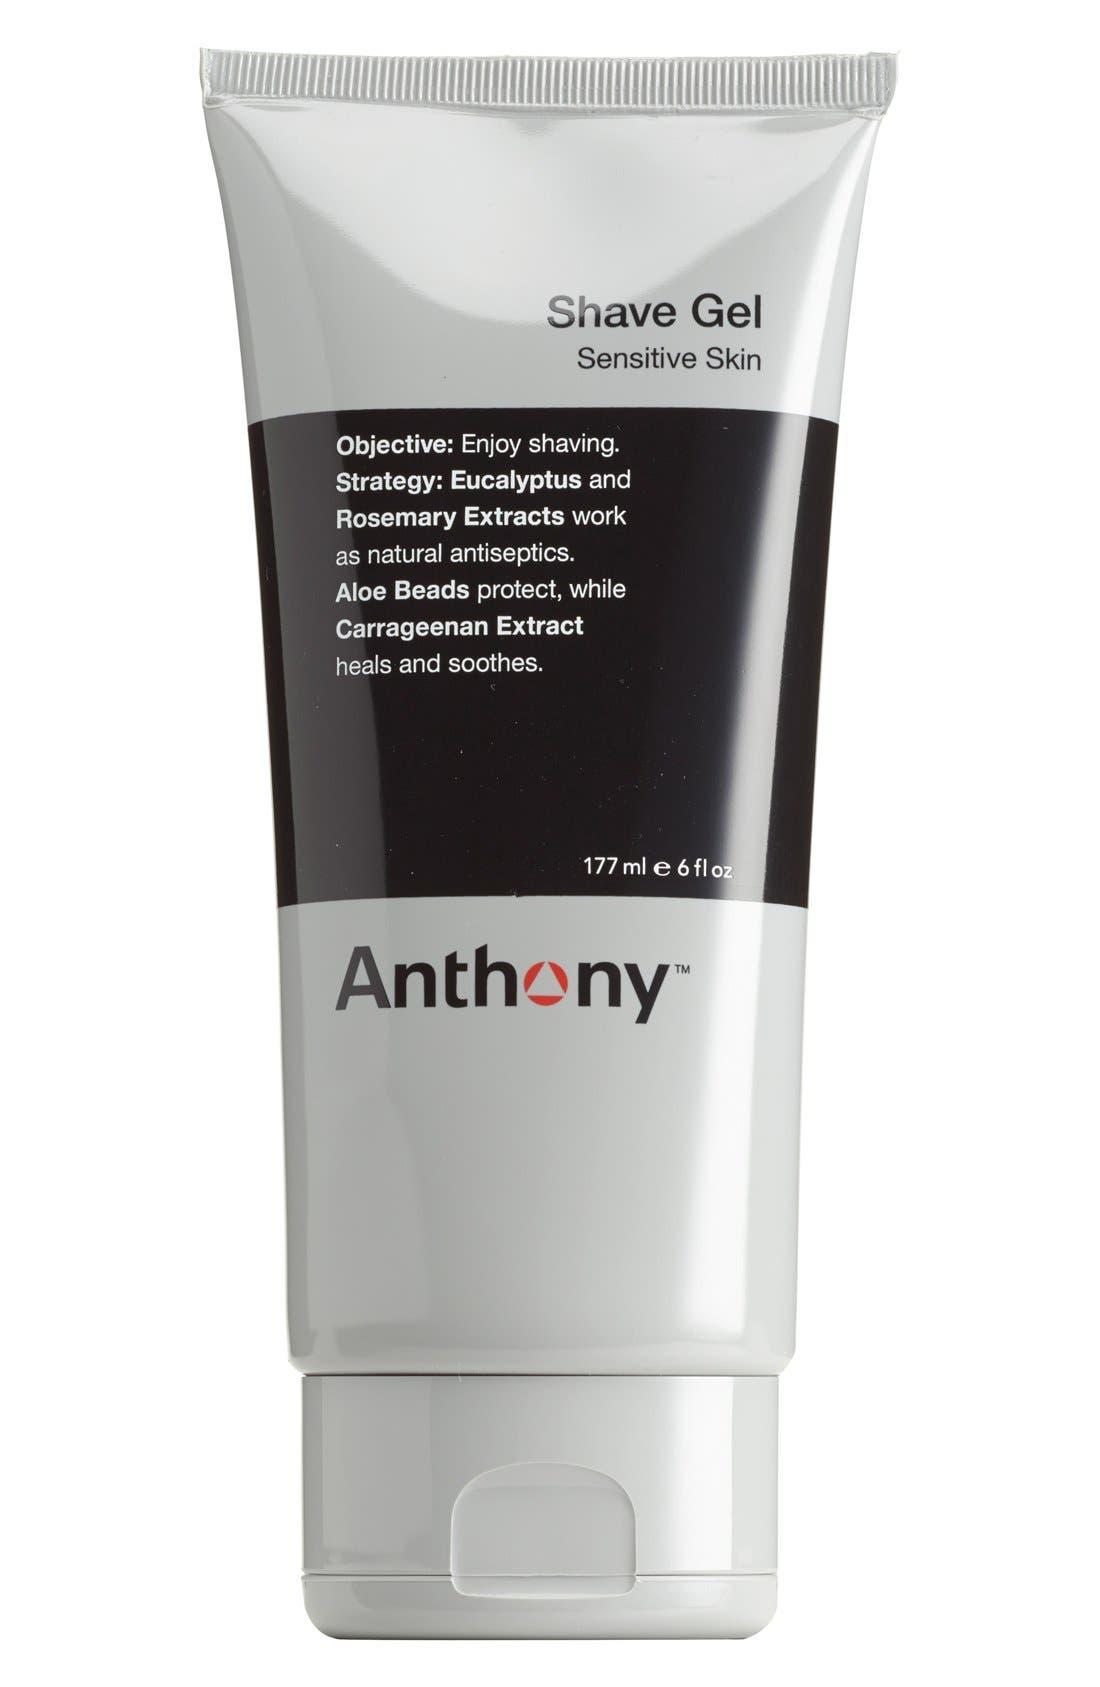 Anthony™ Shave Gel